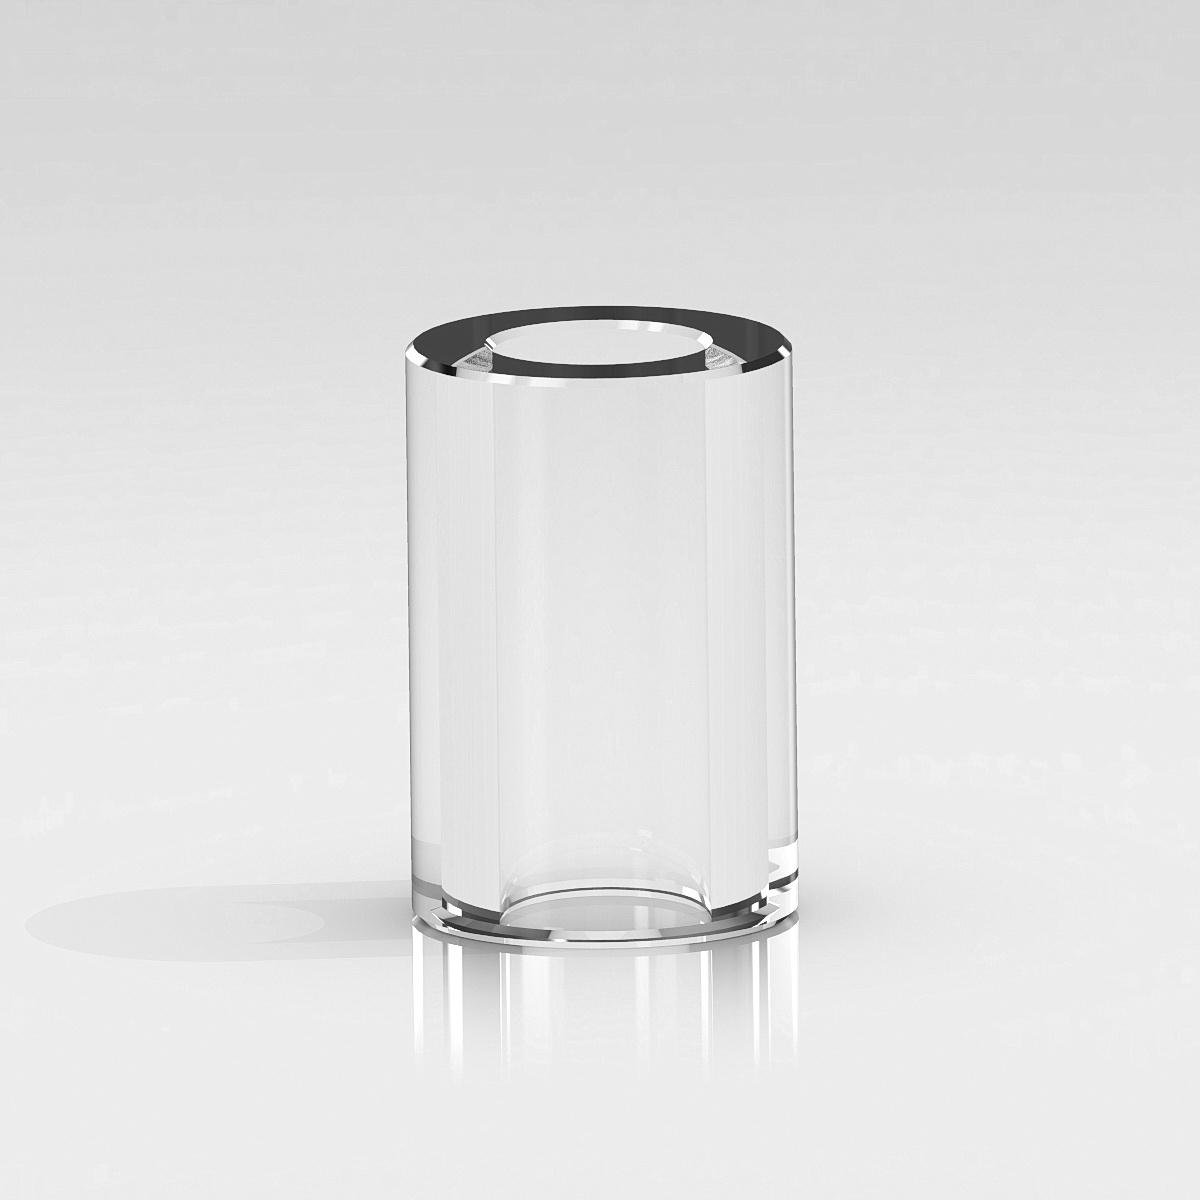 Clear Plastic Tubing, 3/8'' OD x 1/4'' ID x 1/2'' Length. (For 1/4-20 Stud)